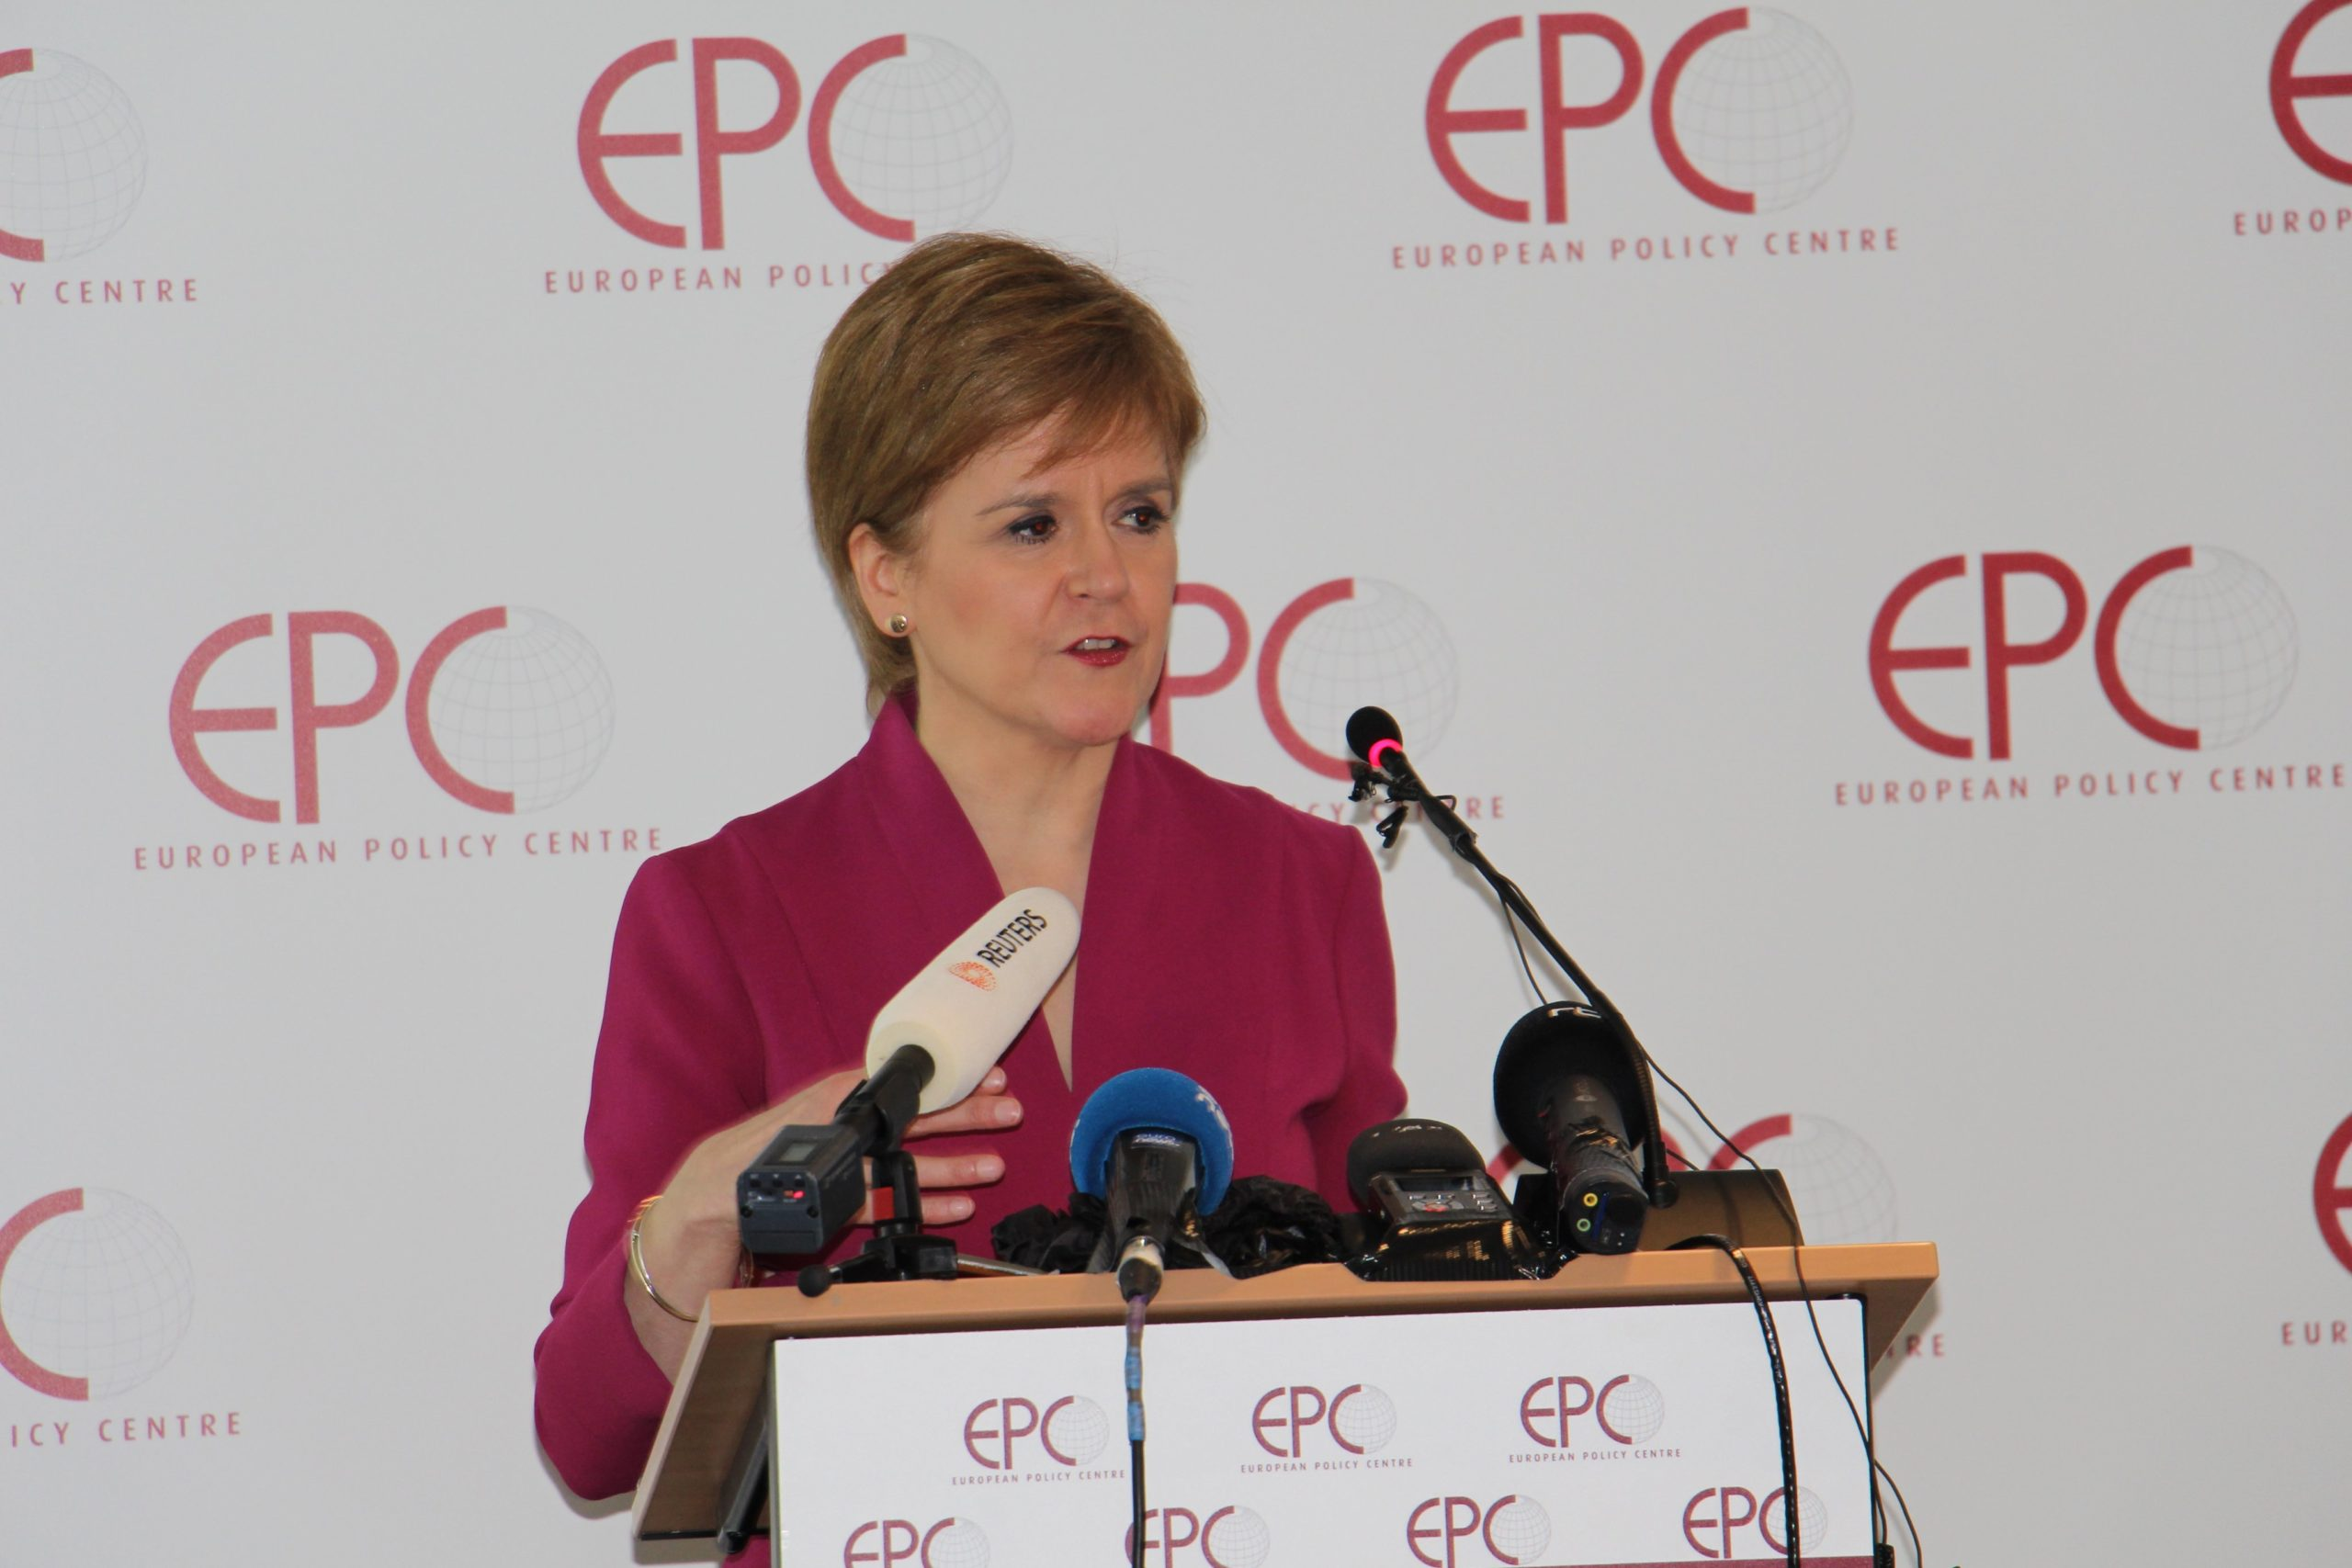 Nicola Sturgeon speaking at the European Policy Centre.